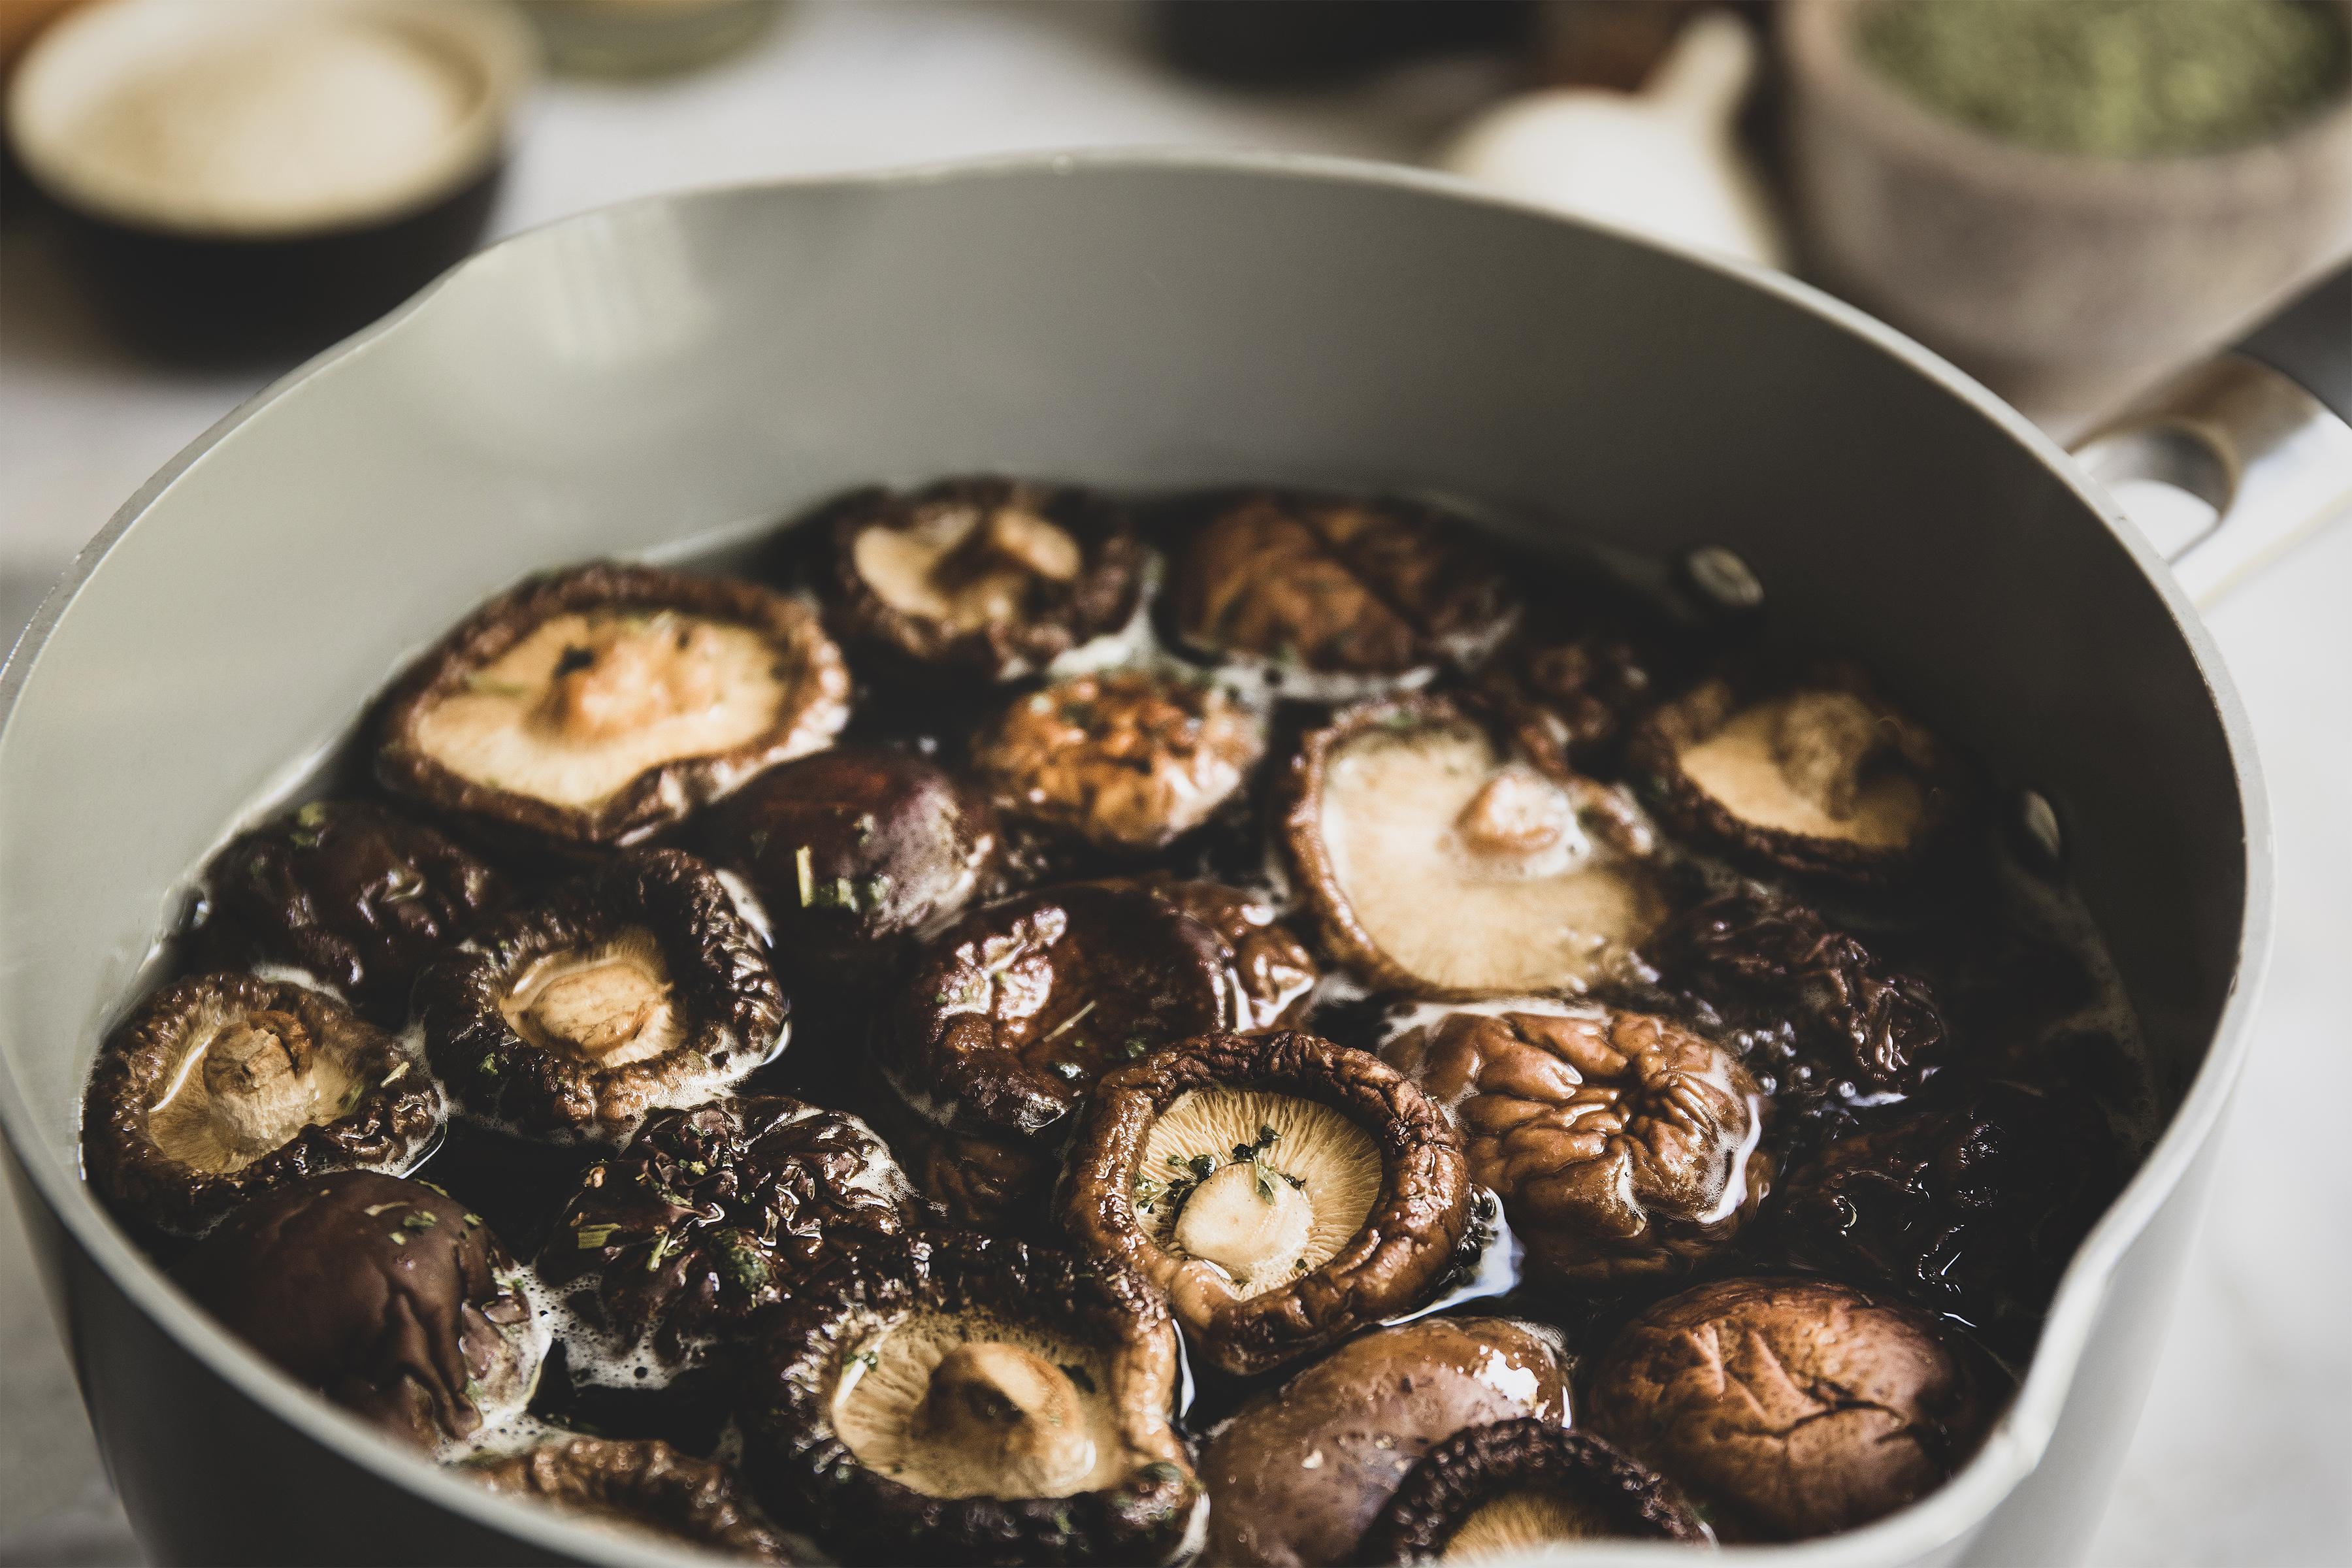 Bowl of shiitake mushrooms soaking in water.